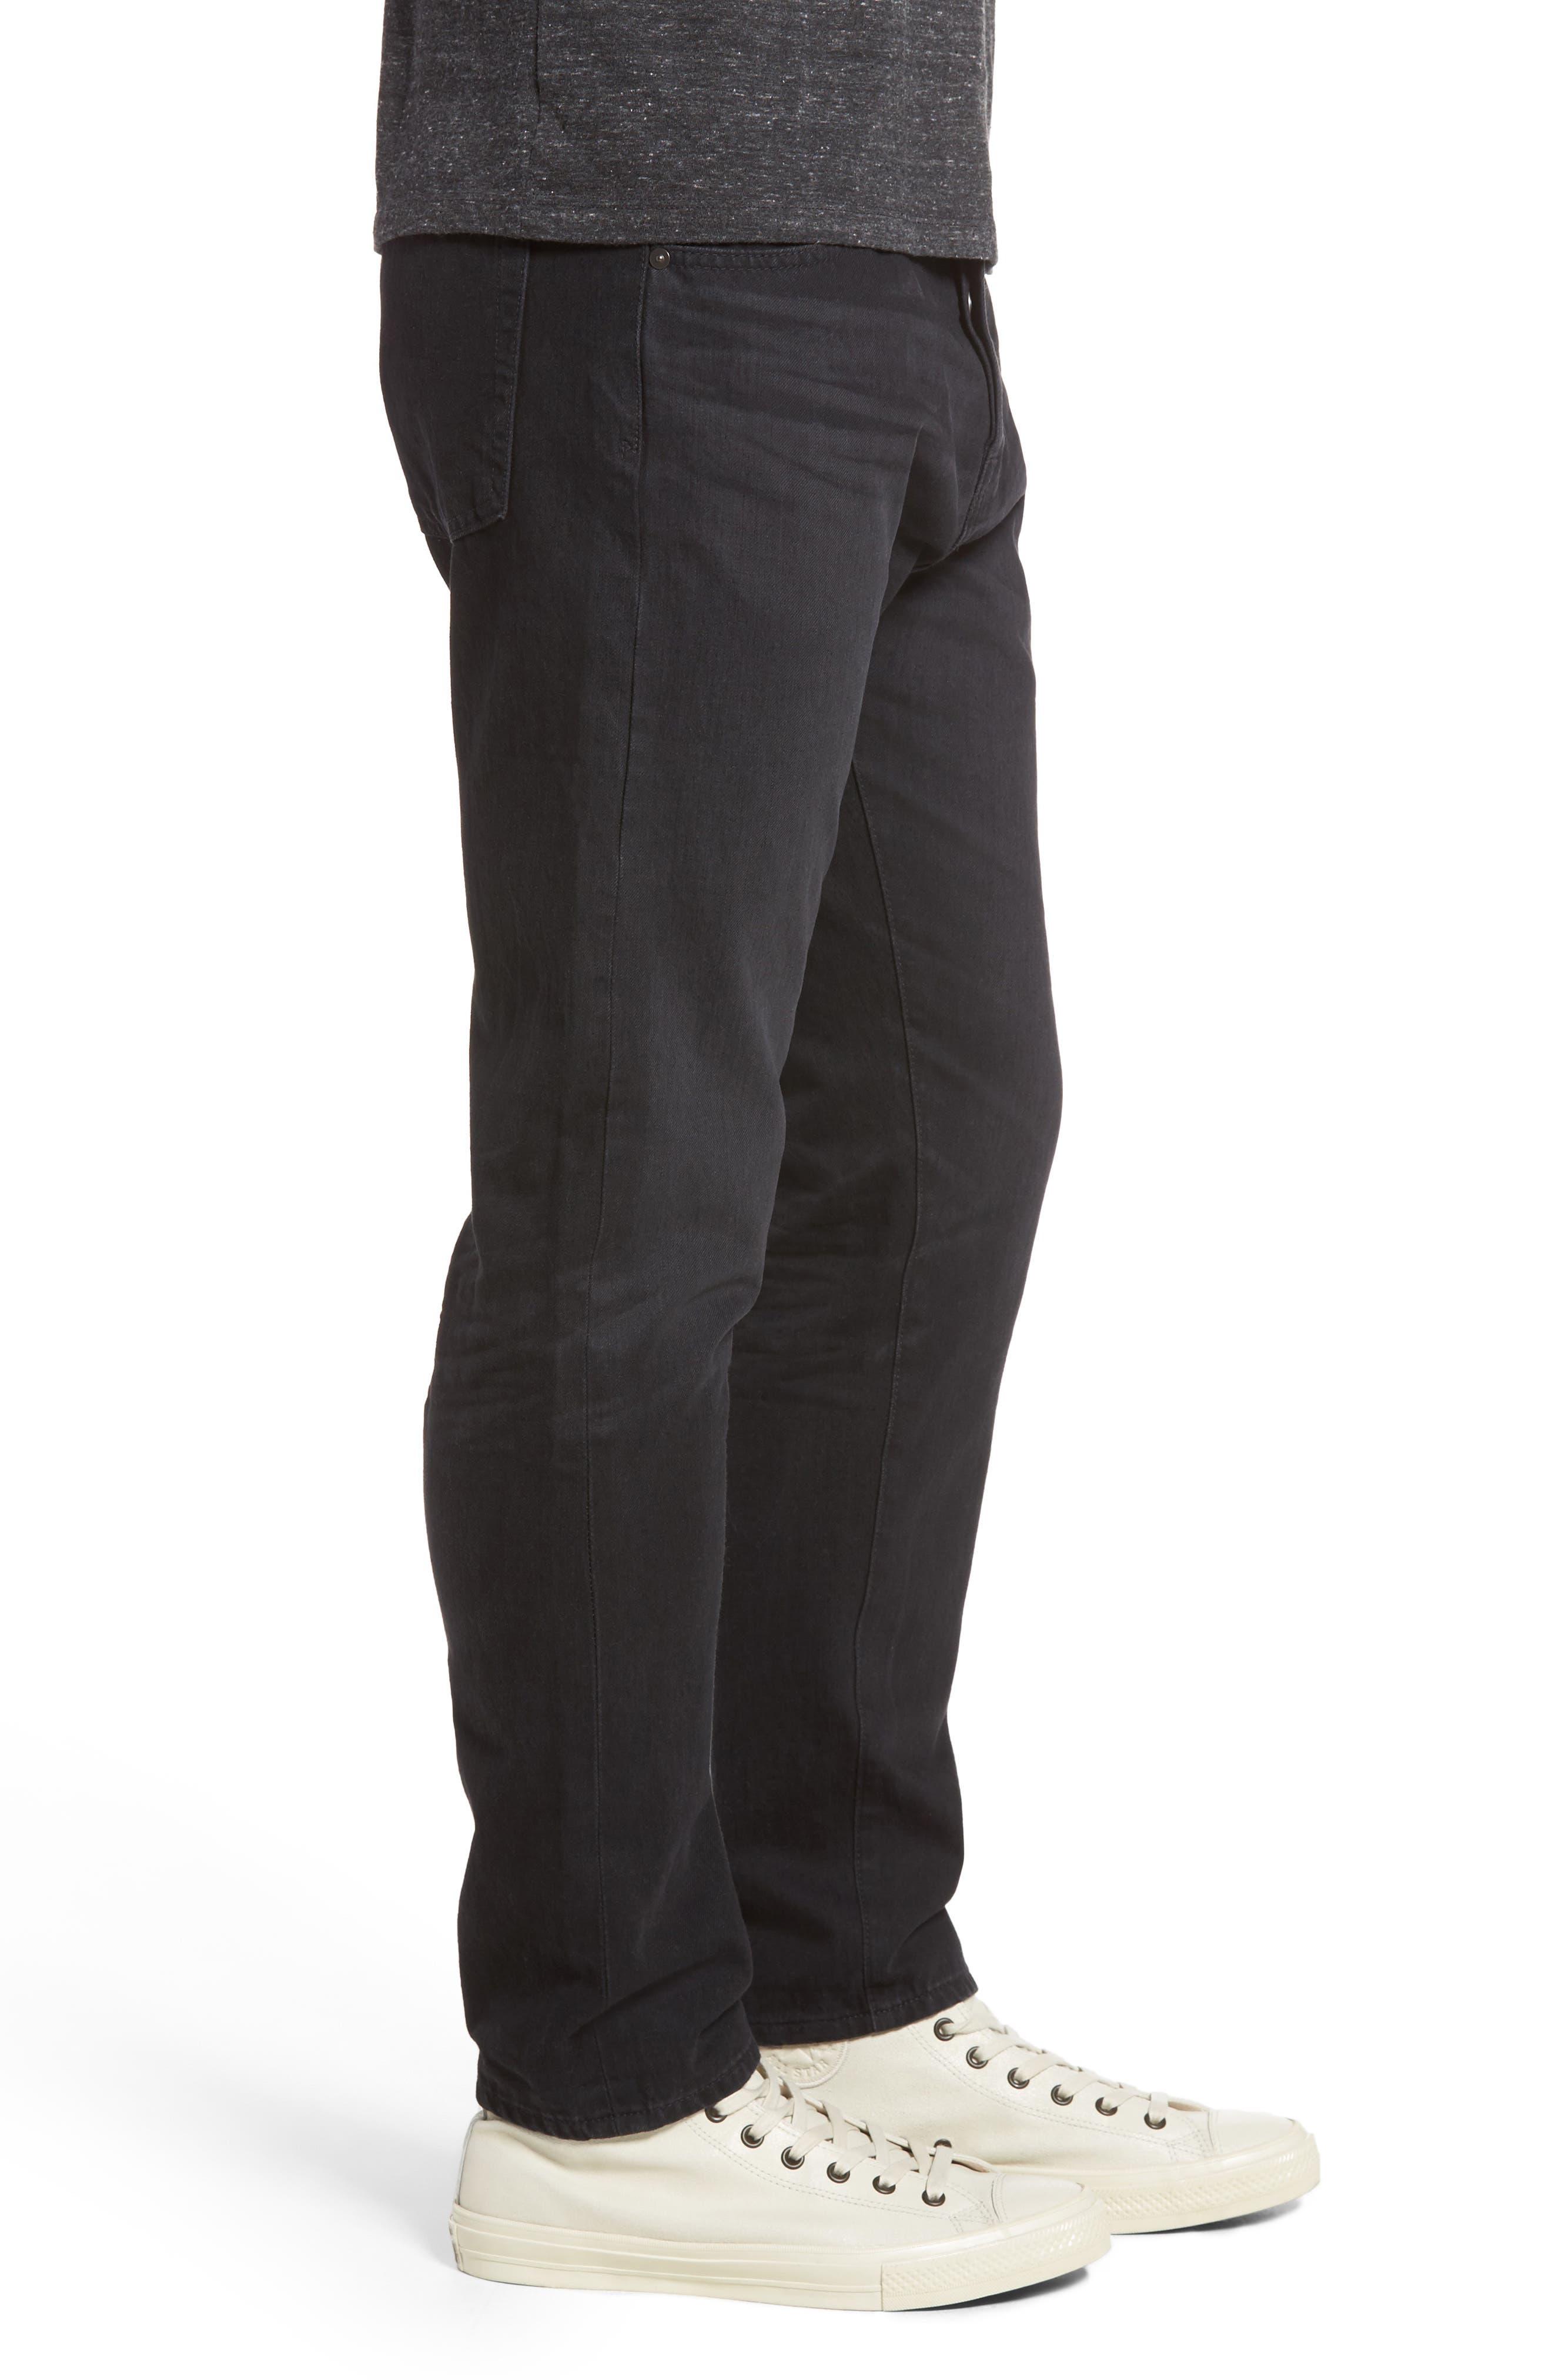 Apex Slouchy Slim Fit Jeans,                             Alternate thumbnail 3, color,